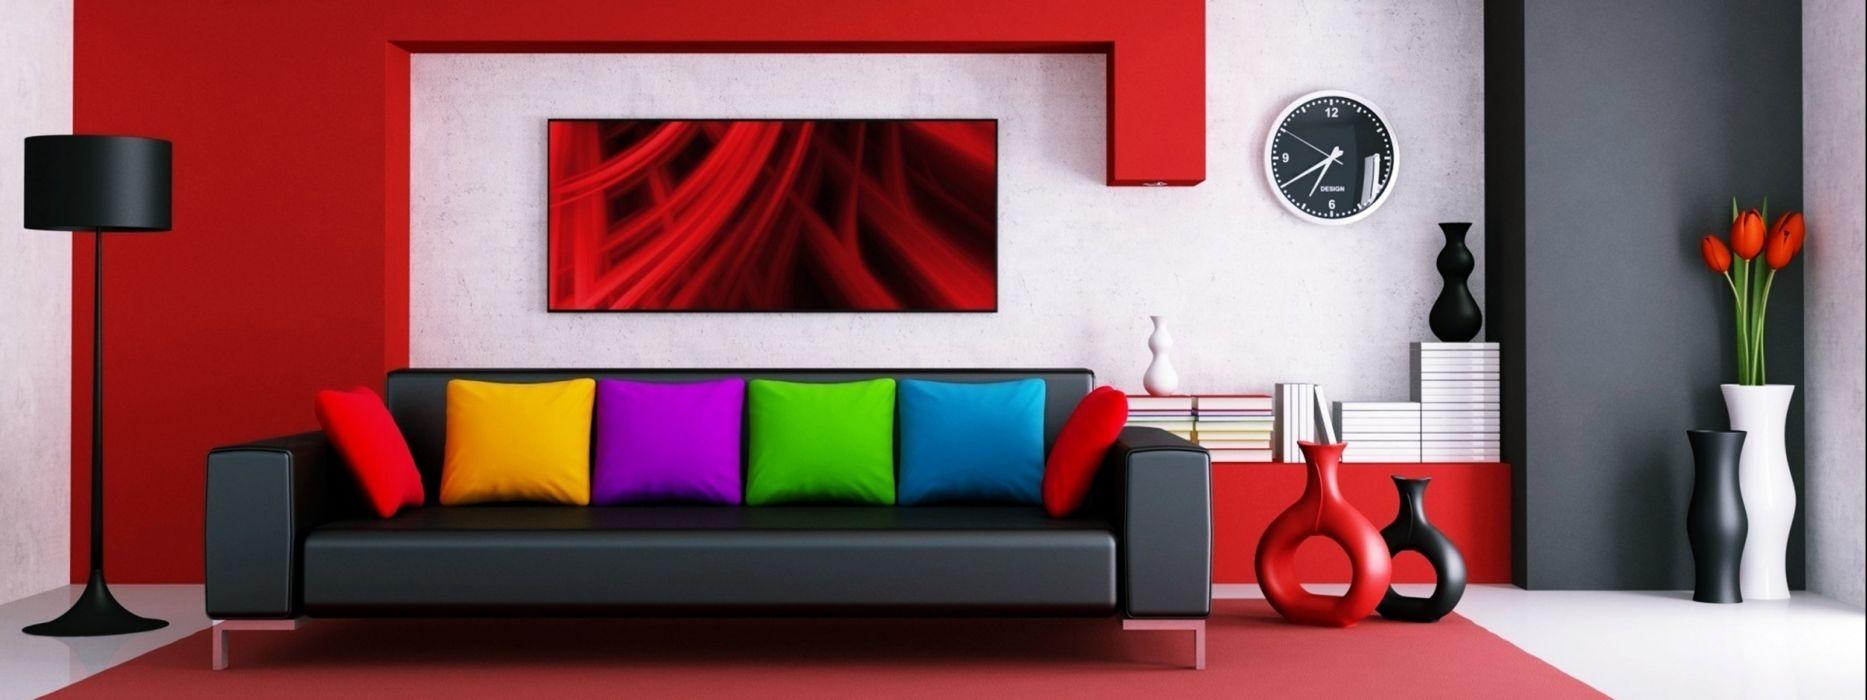 multi monitor dual screen 3200 1200 f wallpaper